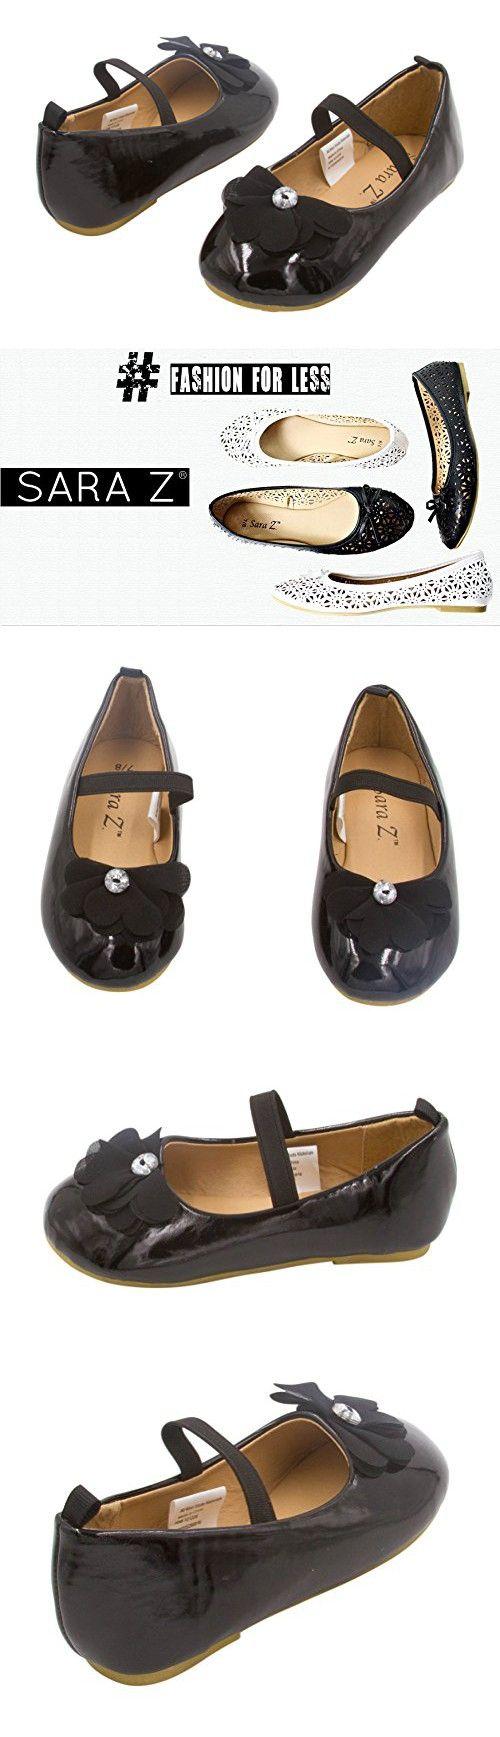 Sara Z Toddler Ballet Flat Patent Slip On Adorned with Chiffon Flower with Rhinestone, Black Size 11-12